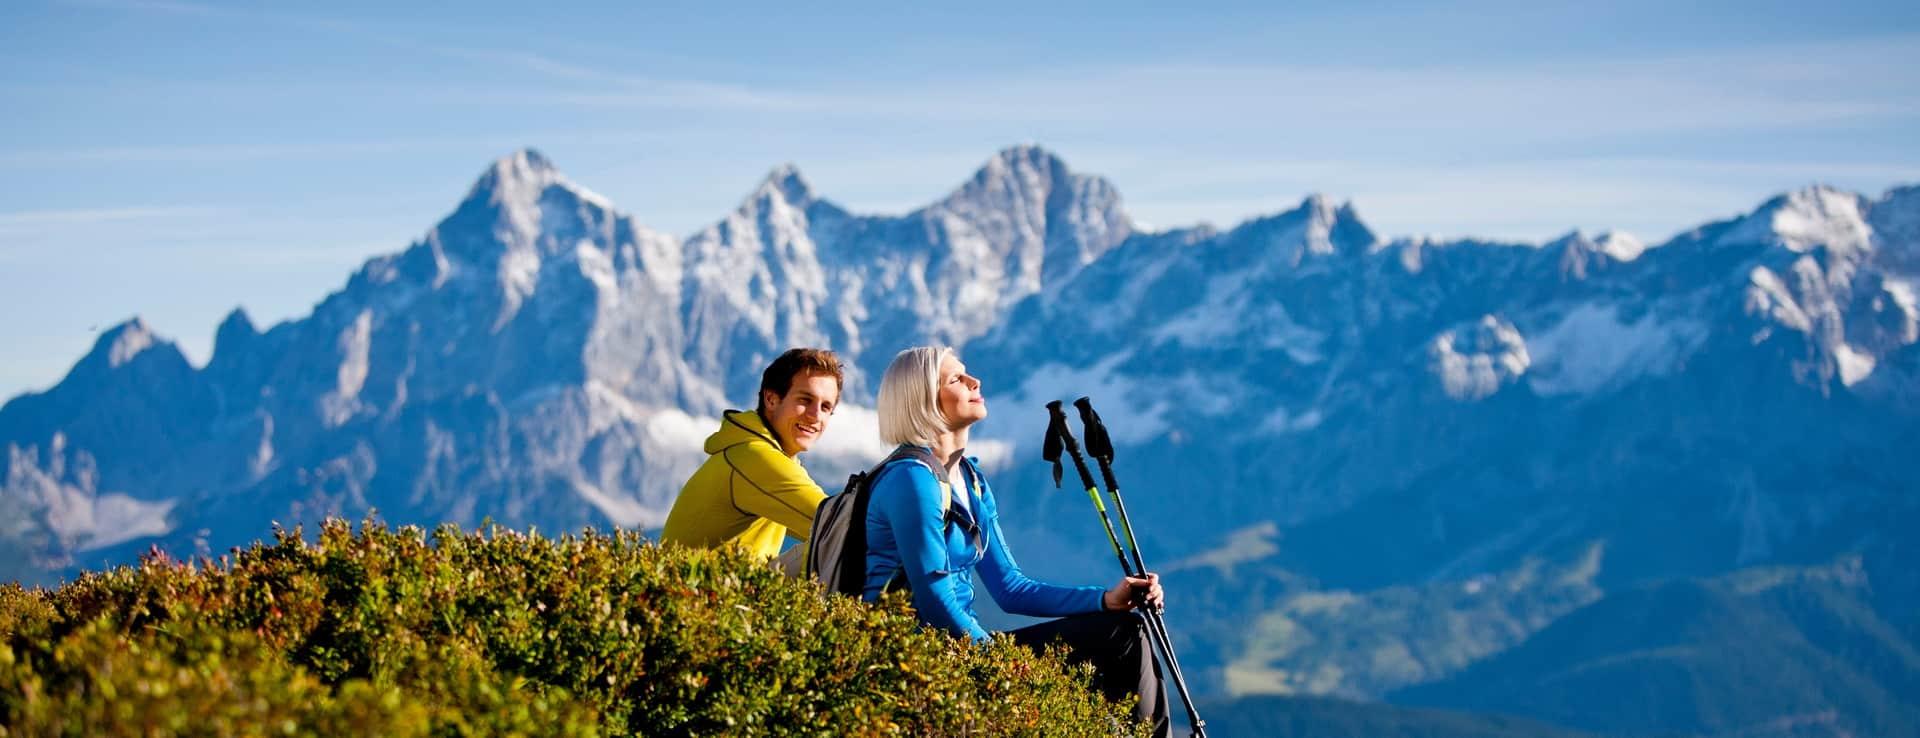 Dachstein Rundwanderweg Semester i Österrike Alperna Austria Travel